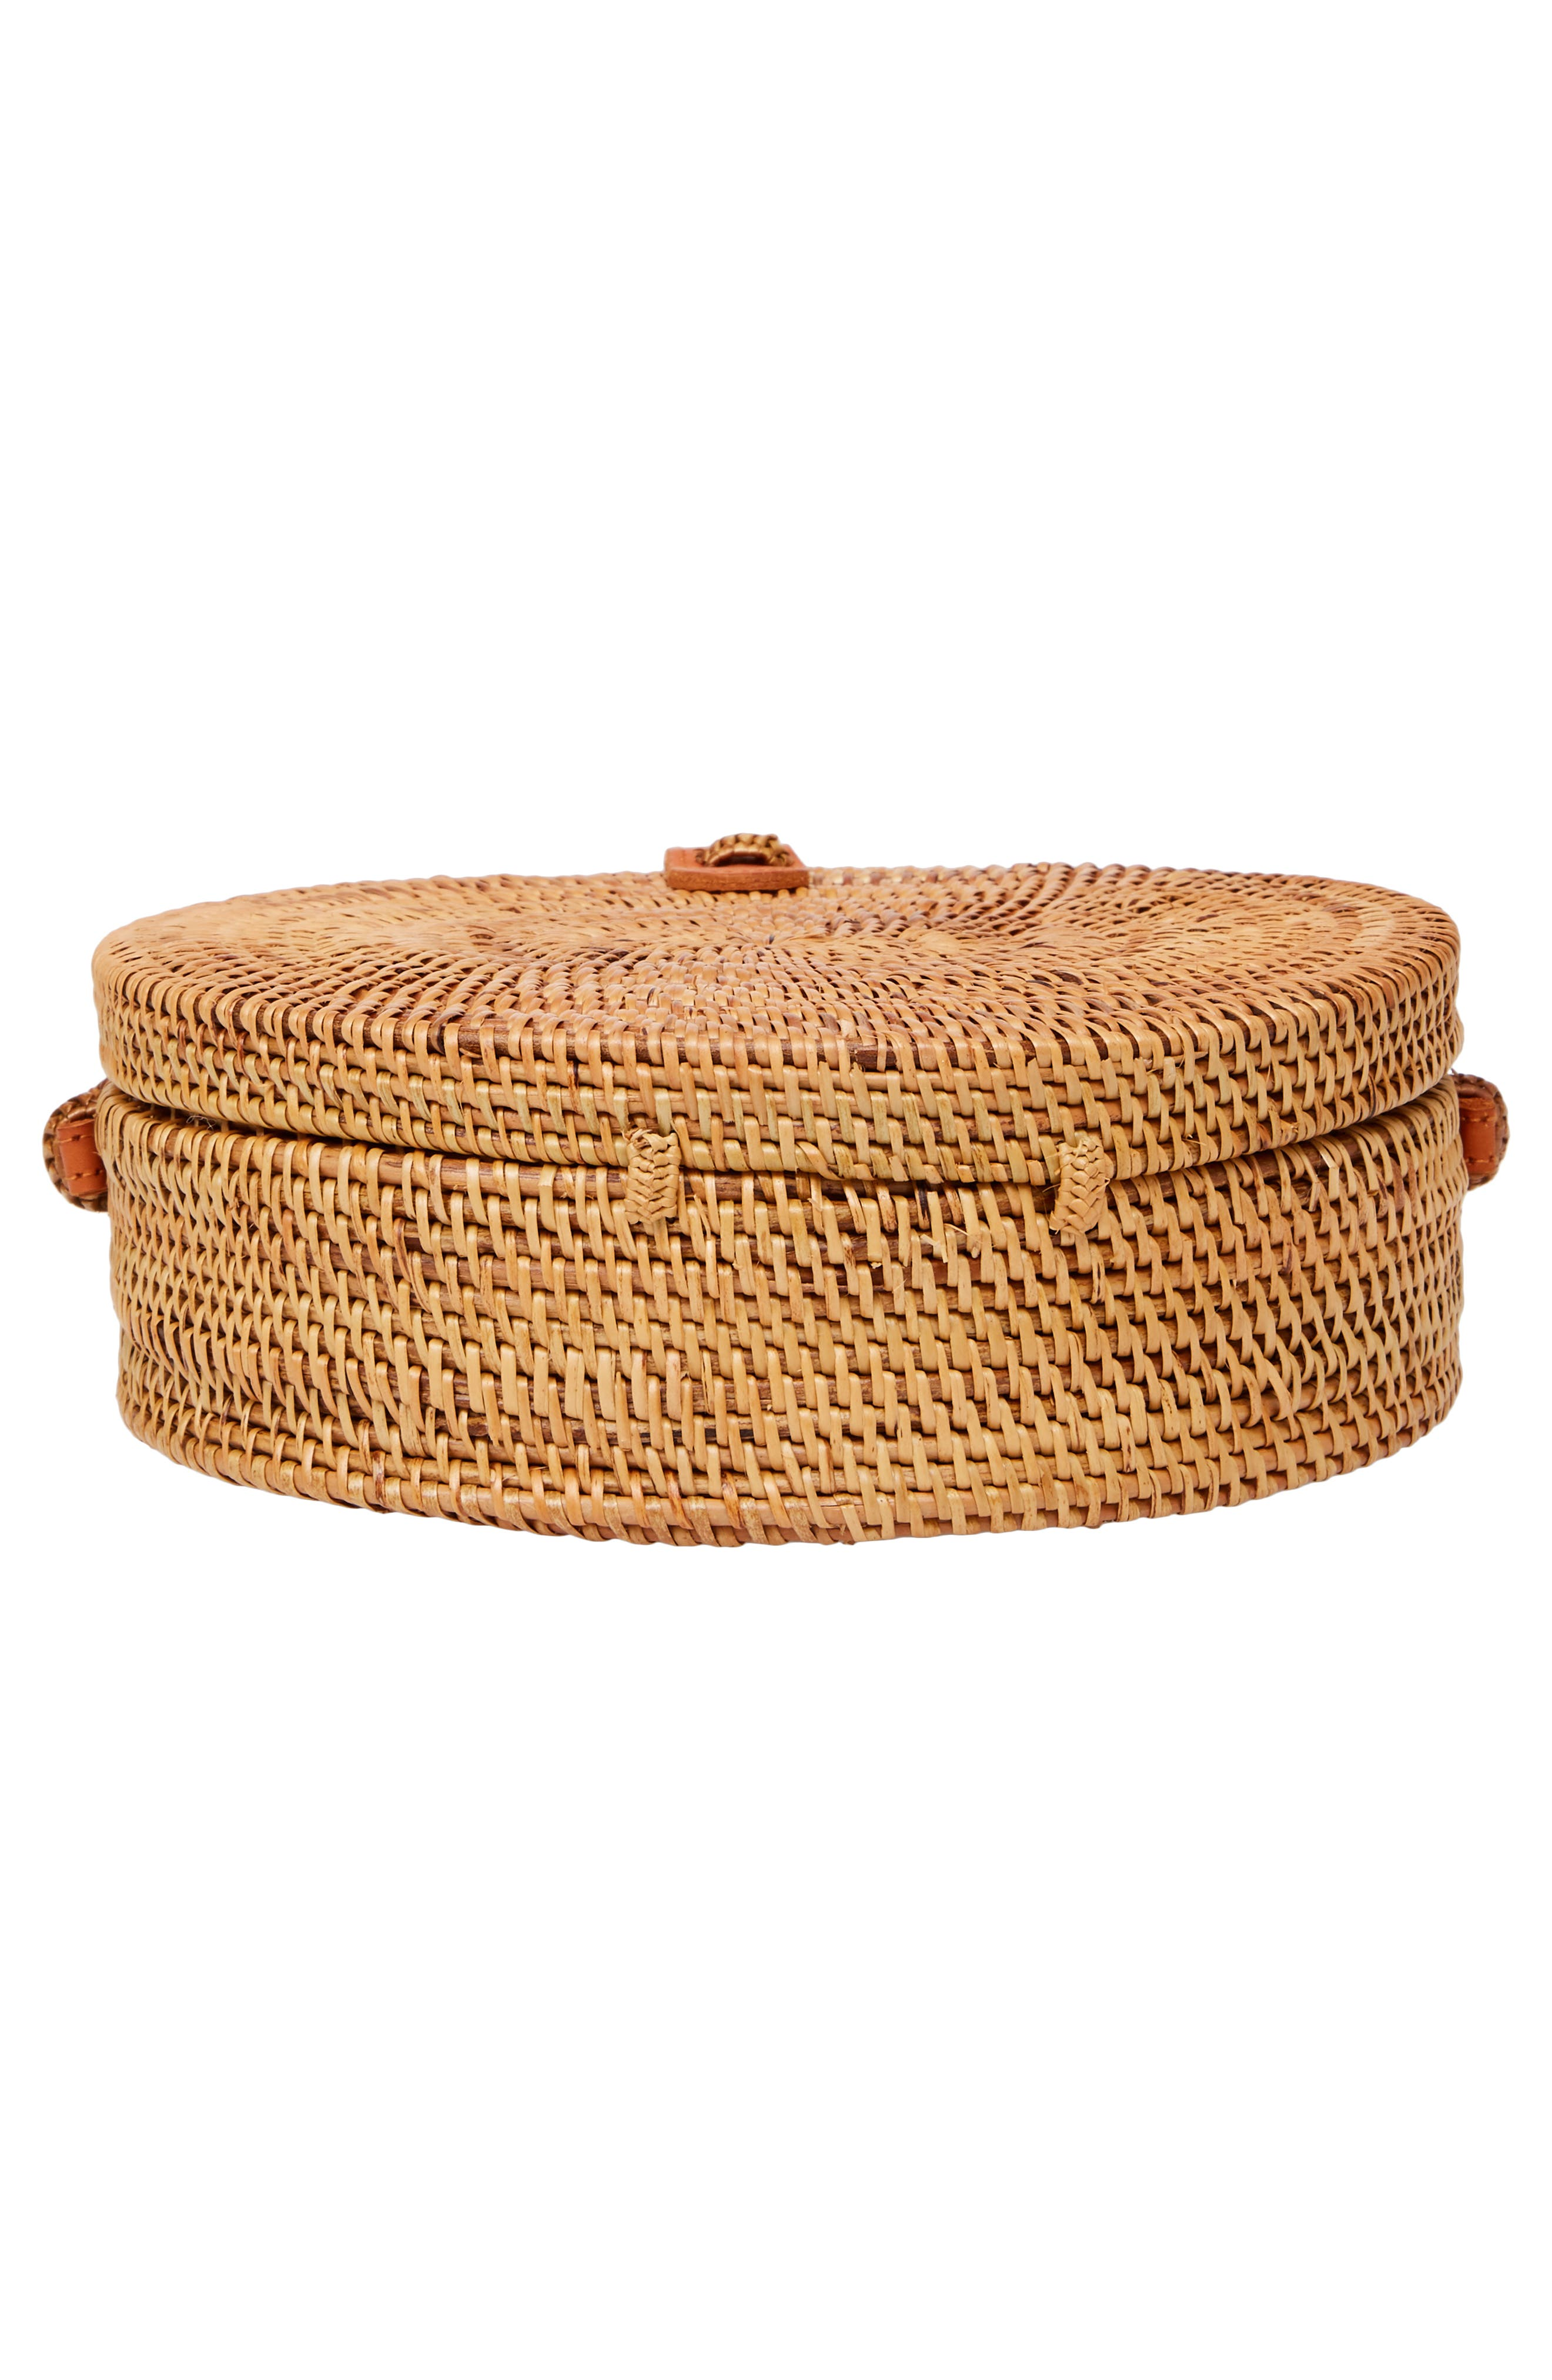 Woven Rattan Circle Basket Crossbody,                             Alternate thumbnail 6, color,                             200